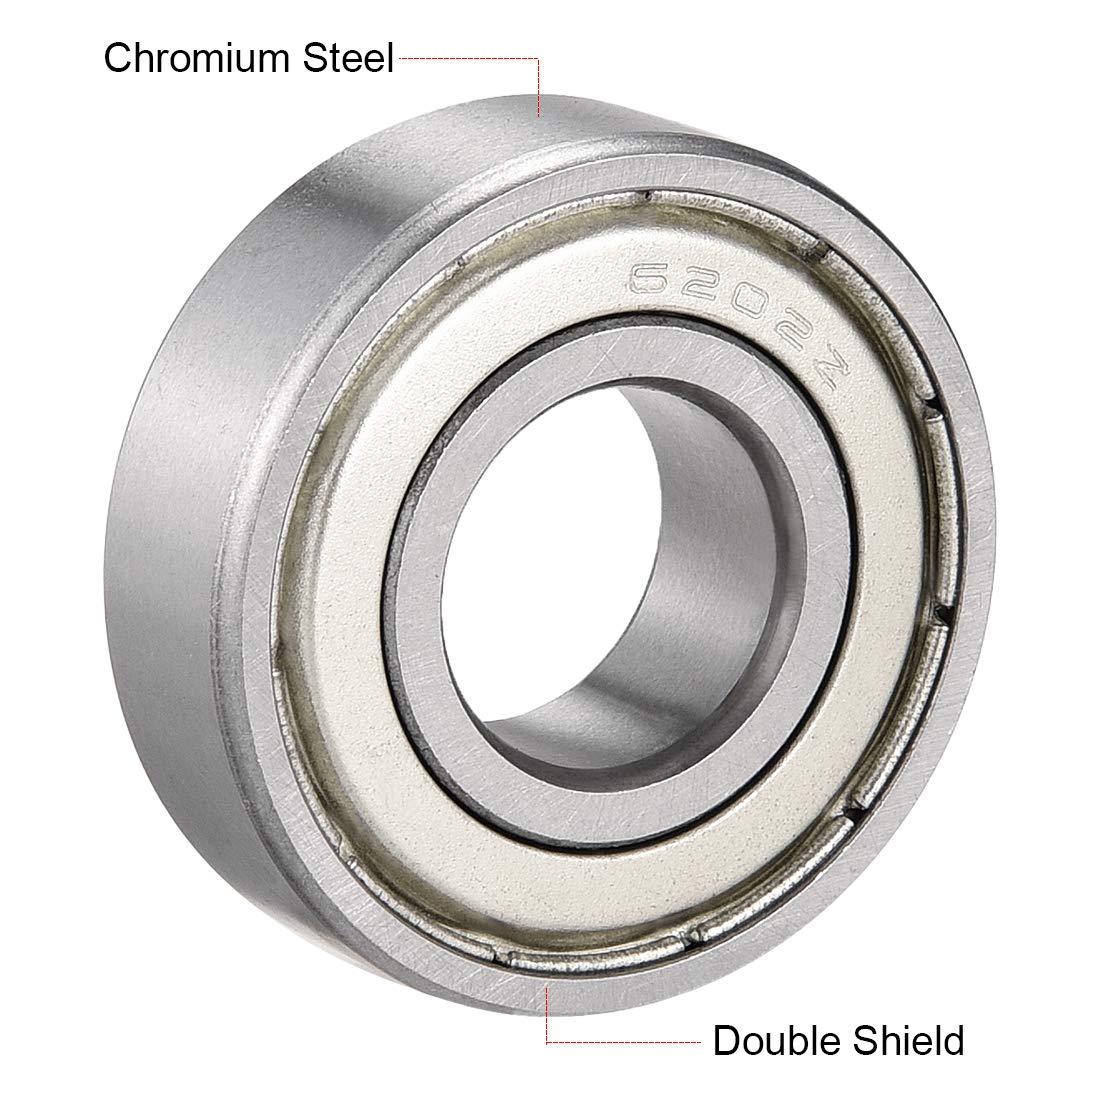 sourcing map 694ZZ Deep Groove Ball Bearings Z2 4mm X 11mm X 4mm Double Shielded Carbon Steel 2pcs